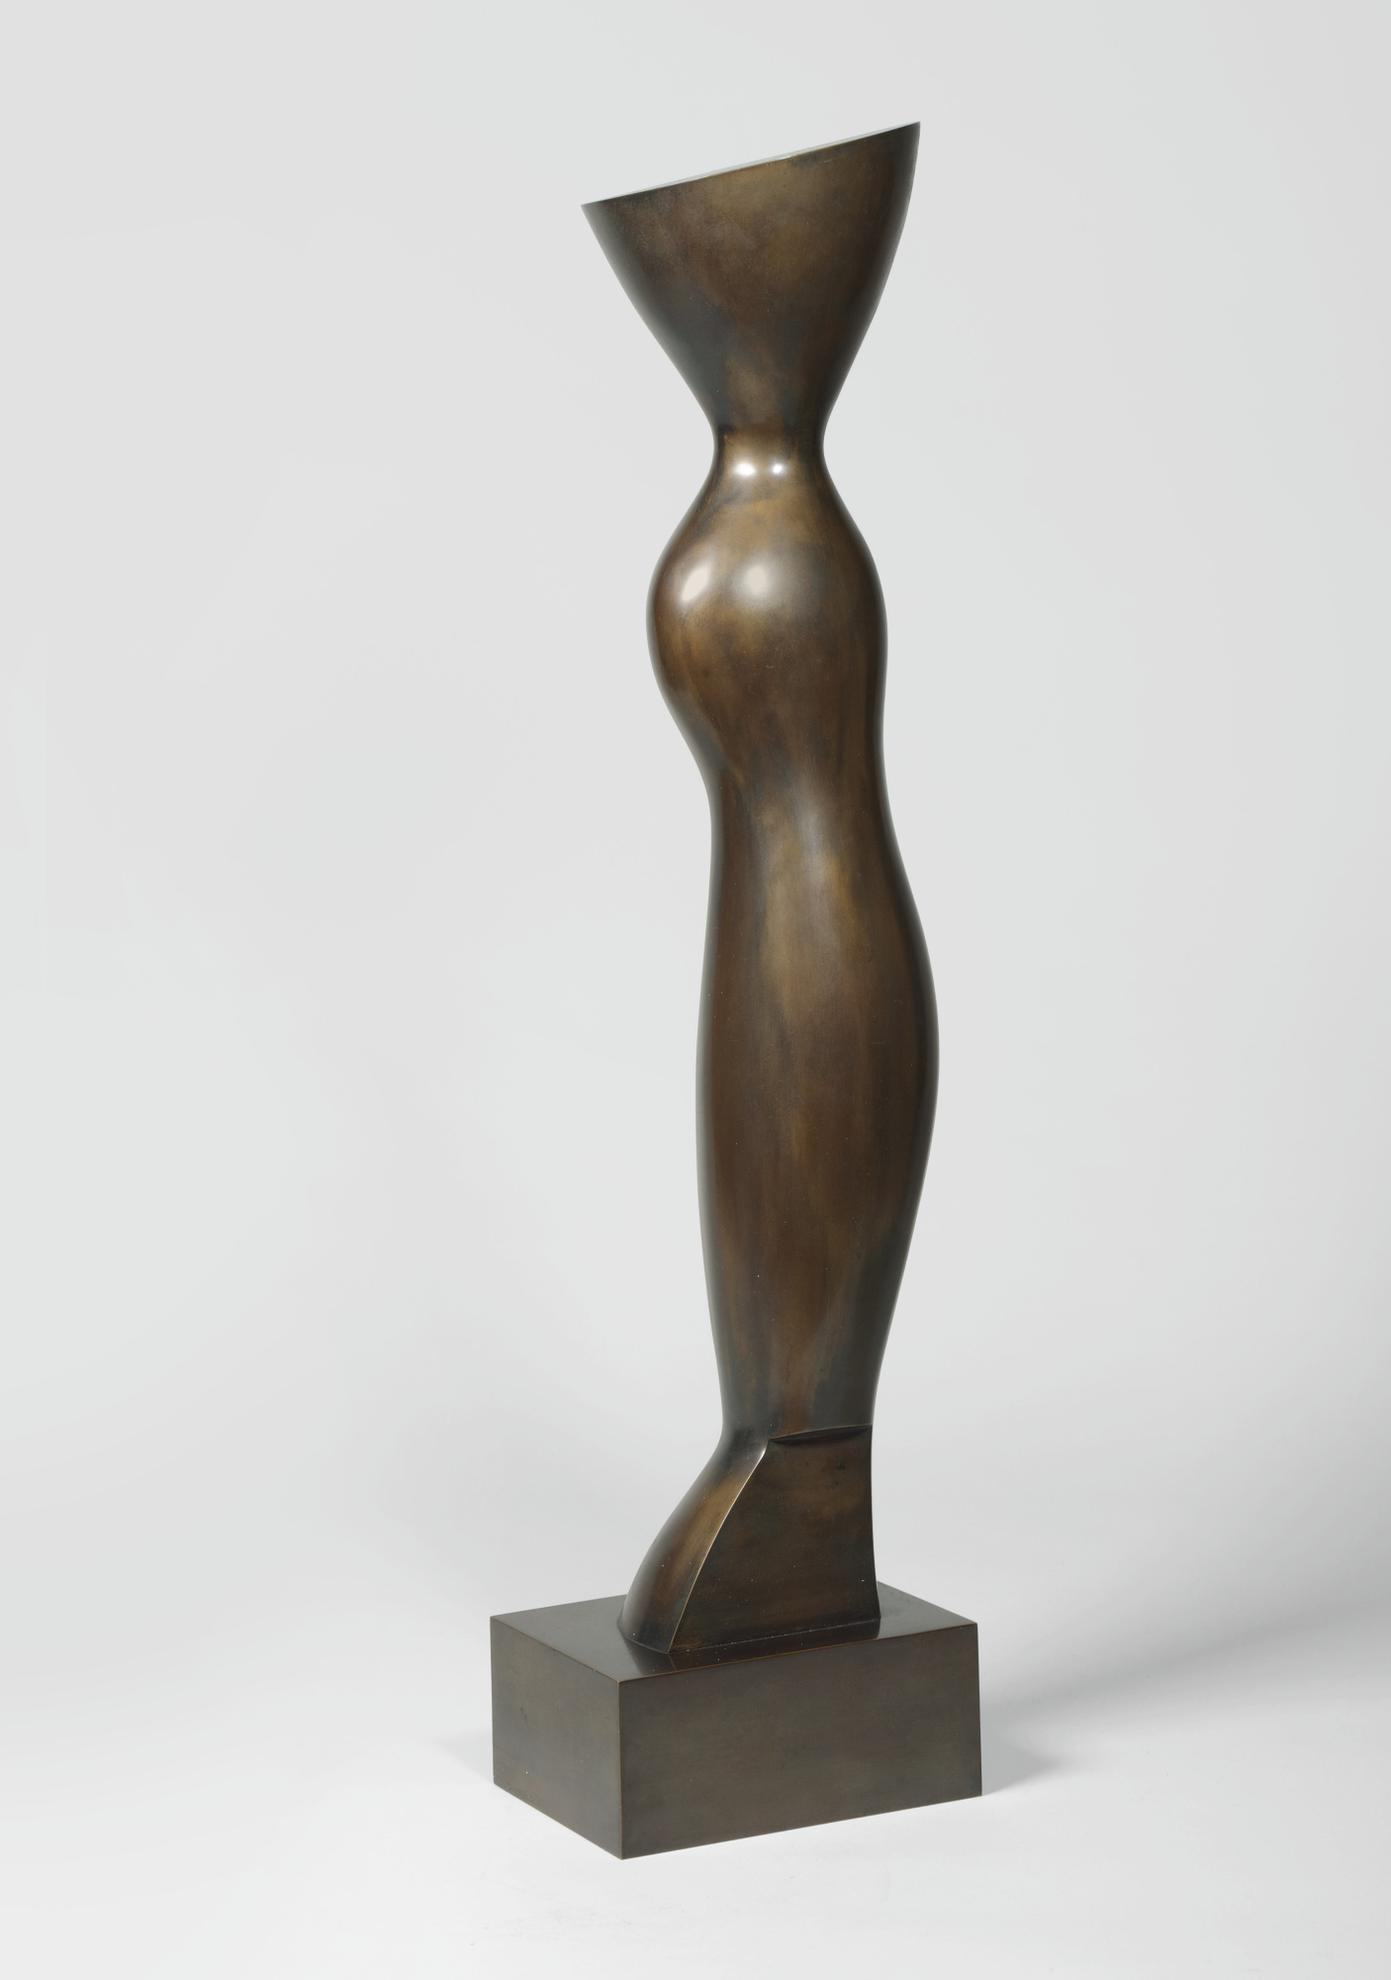 Jean Arp-Torse-Vase-1964